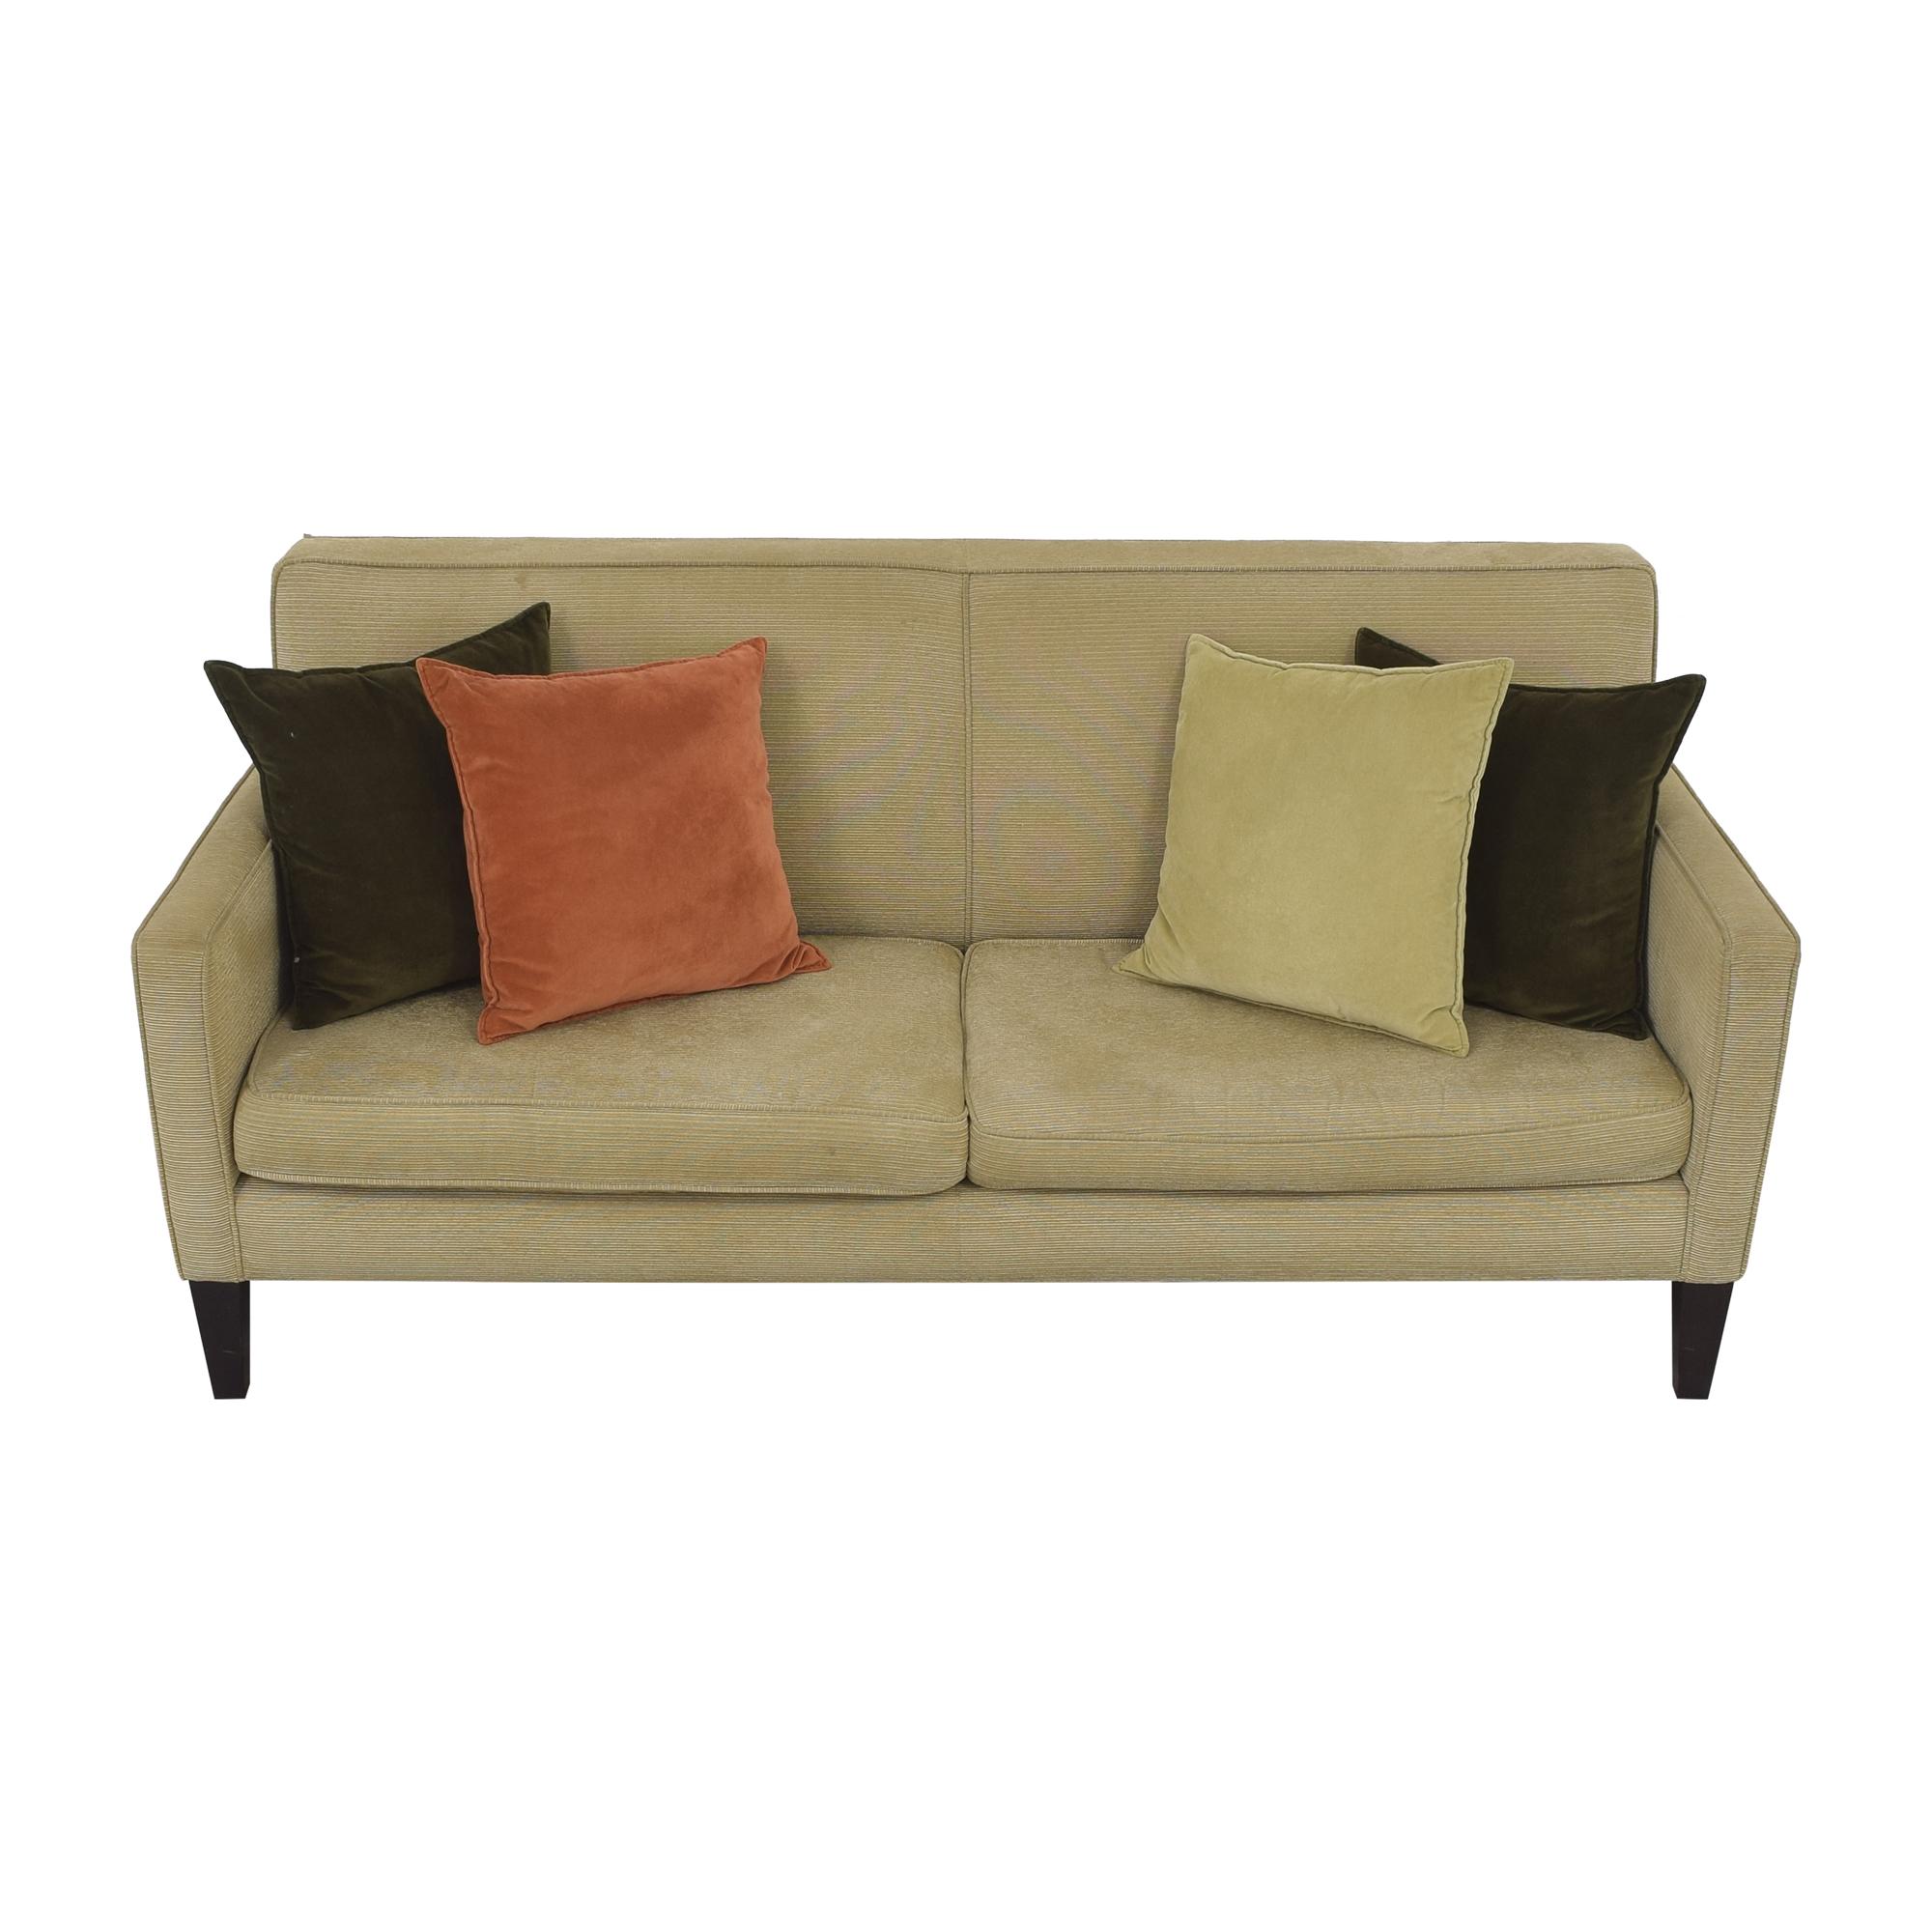 Crate & Barrel Crate & Barrel Sofa on sale